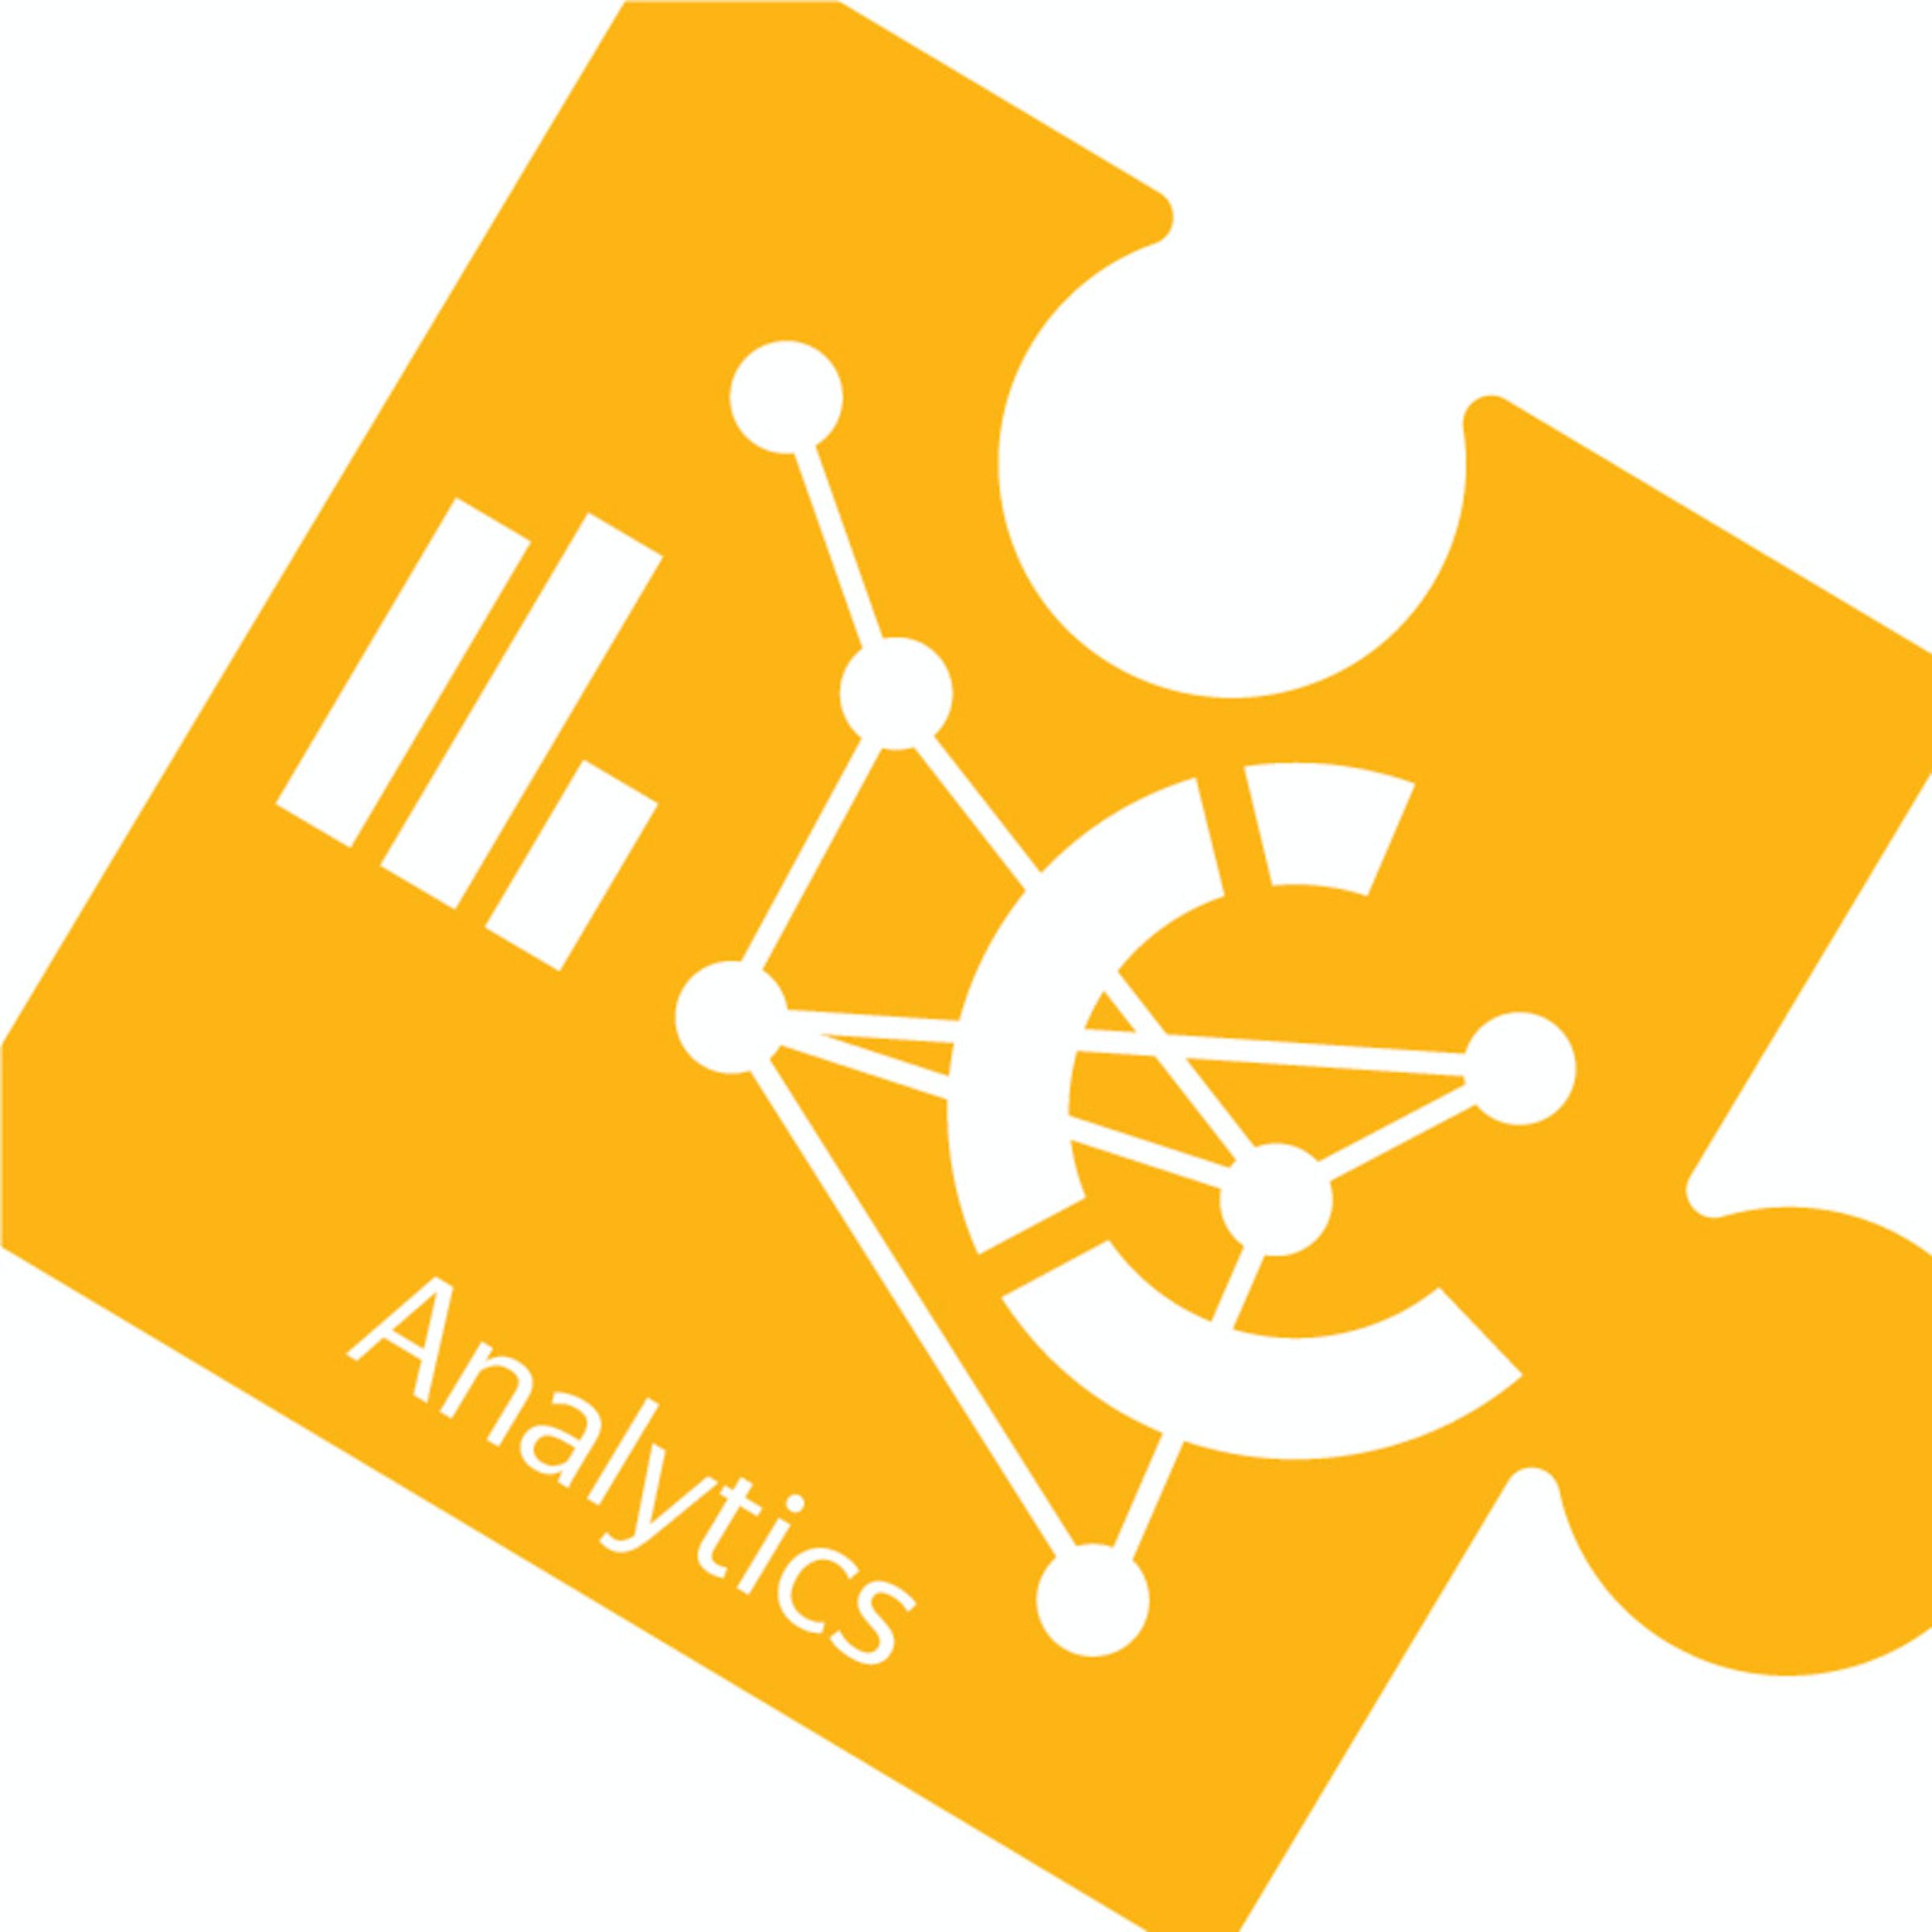 Big Data Analysis: Hive, Spark SQL, DataFrames and